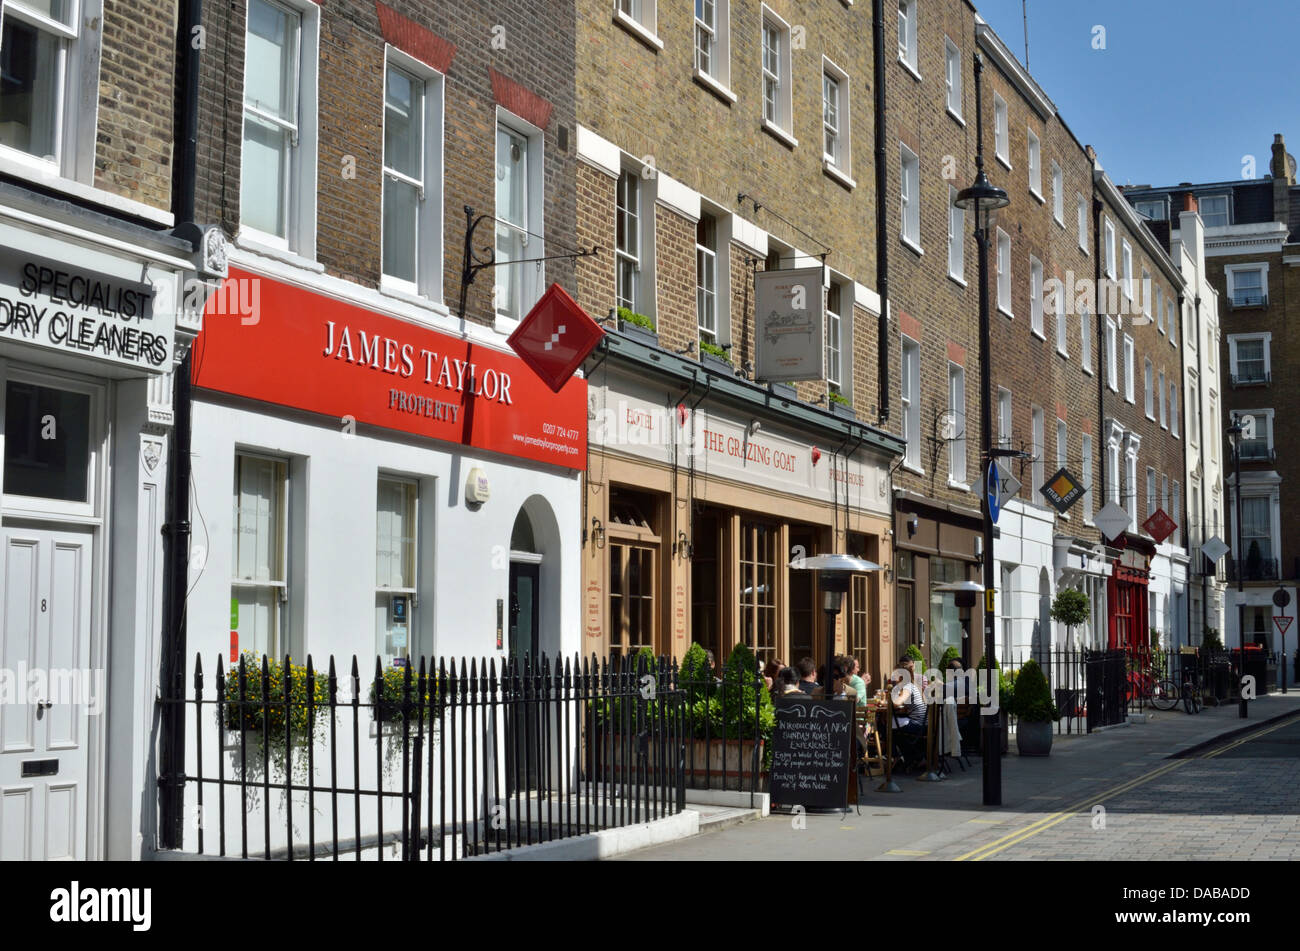 Shop fronts in New Quebec Street W1, Marylebone, London, UK. - Stock Image